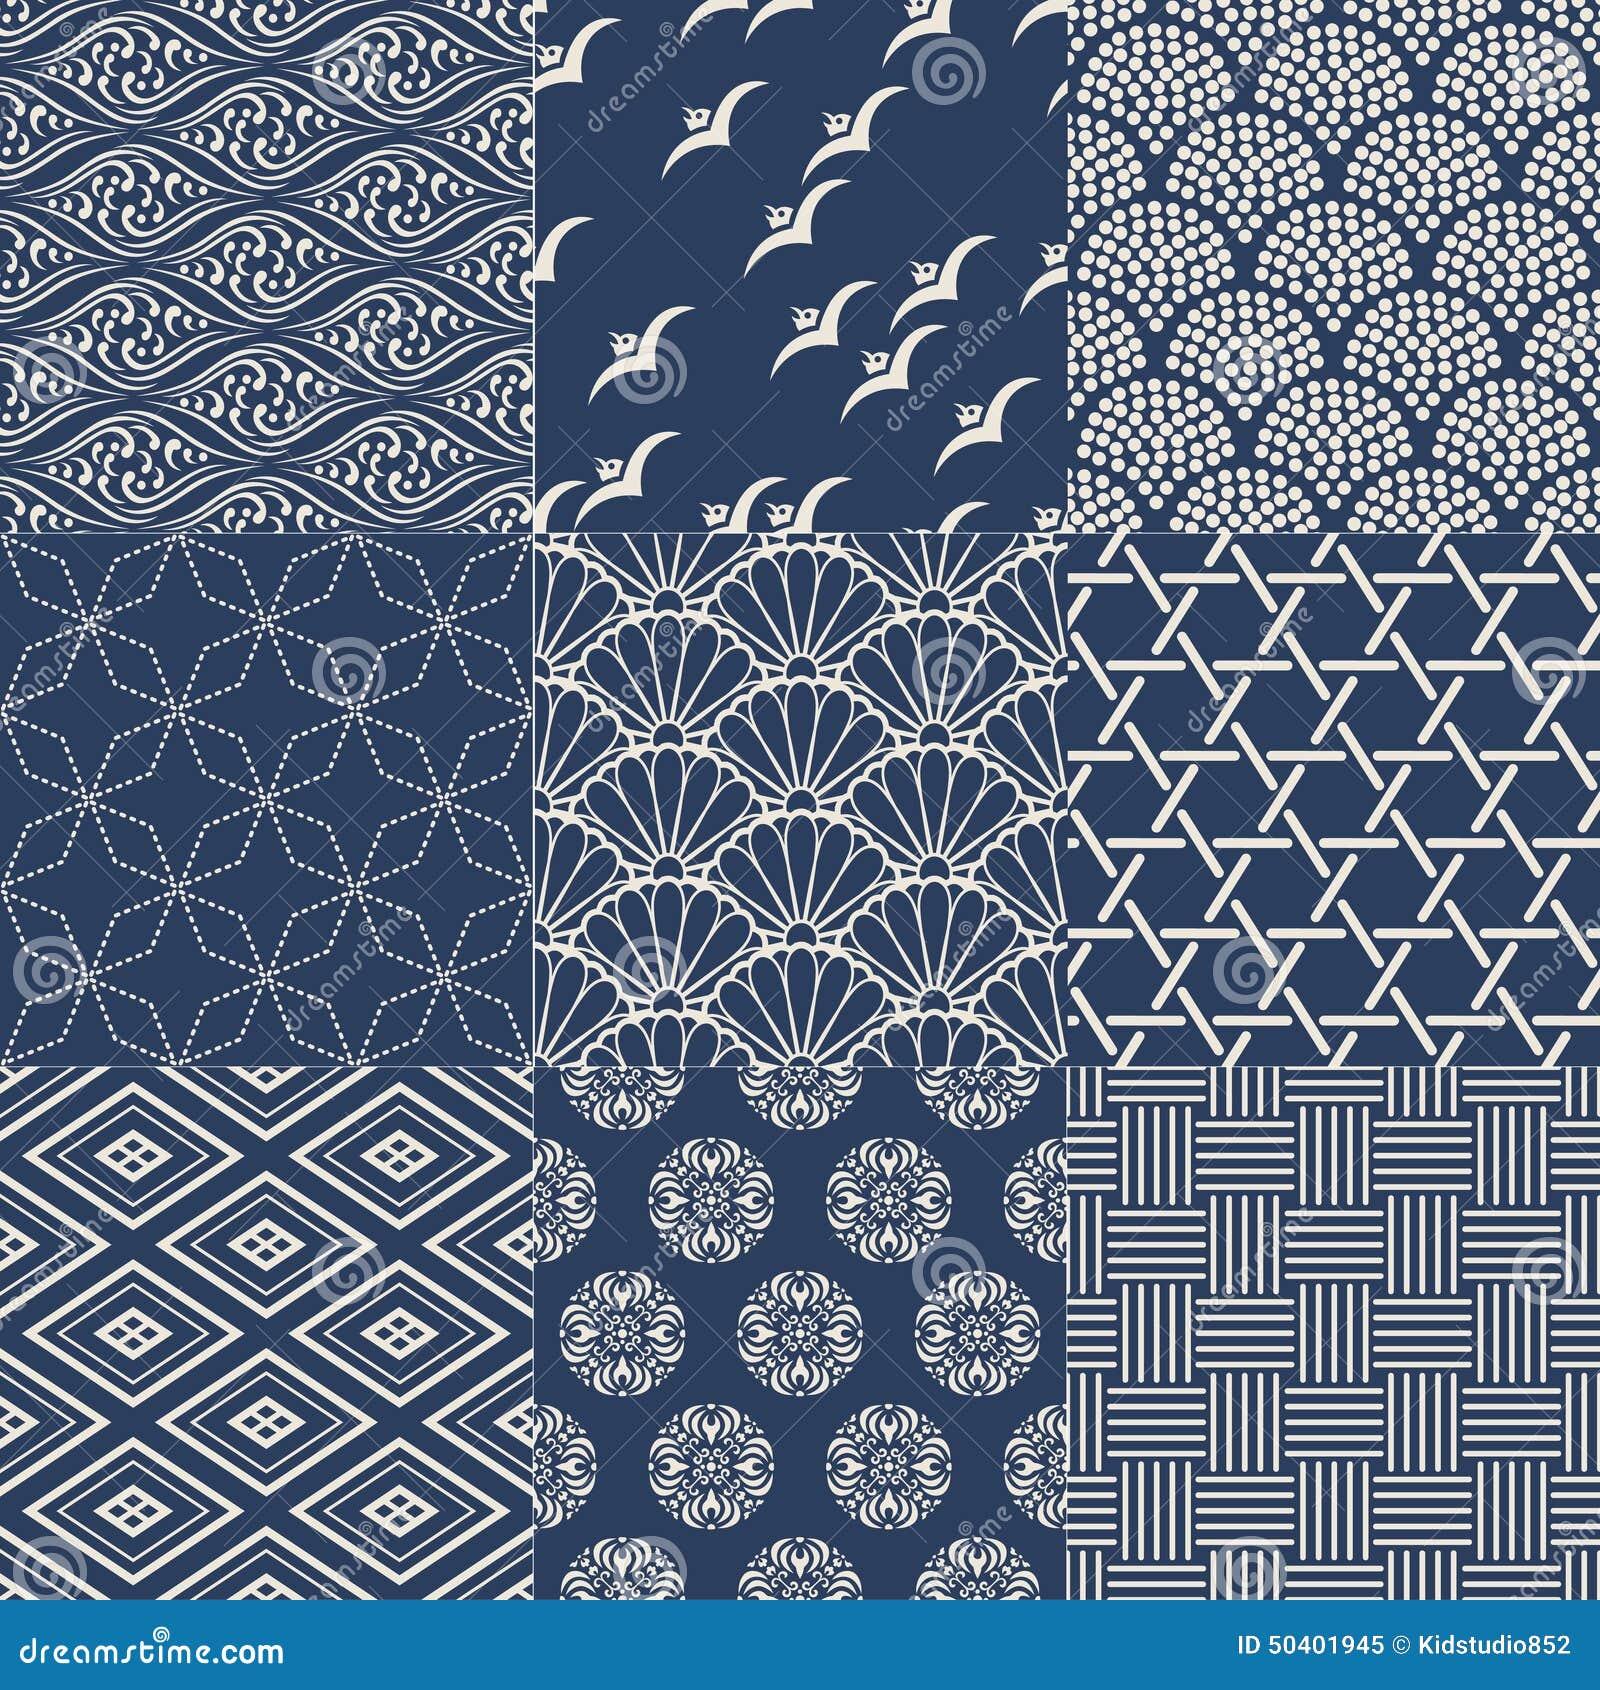 Seamless Japanese Pattern Stock Vector - Image: 50401945